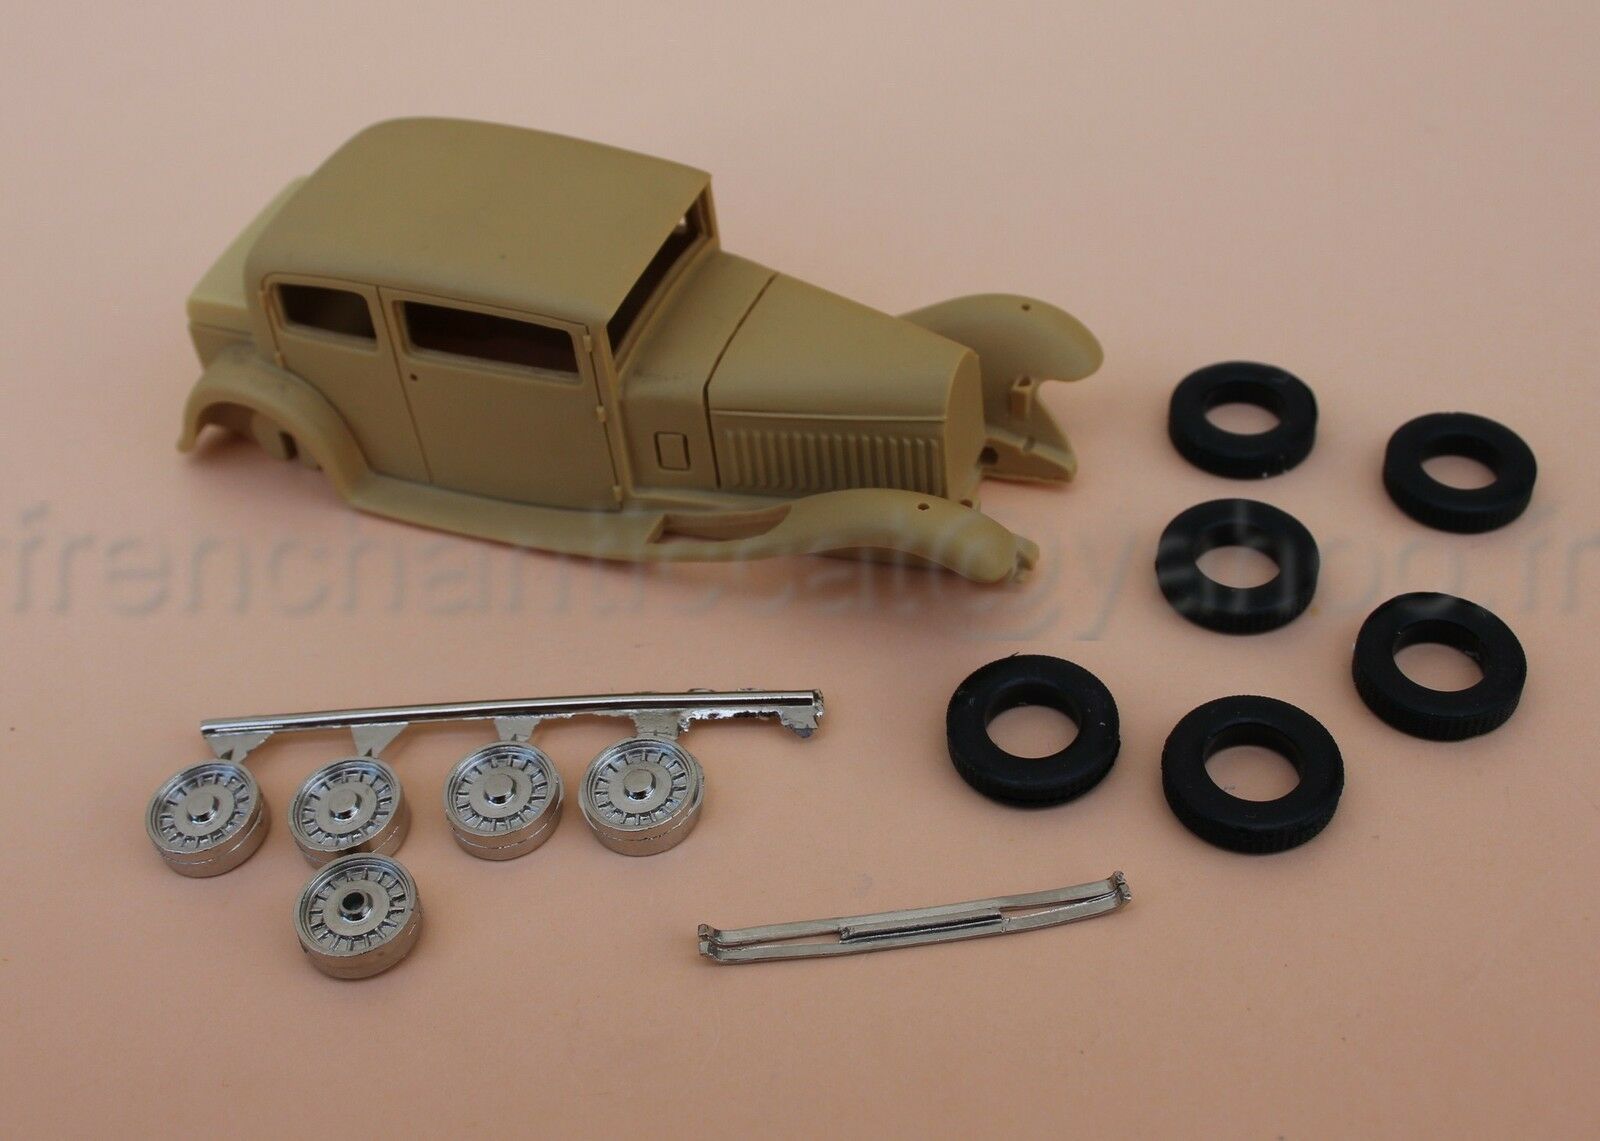 HB Voiture Bugatti Type 46 berline 1 43 Heco miniatures resine jantes pneu